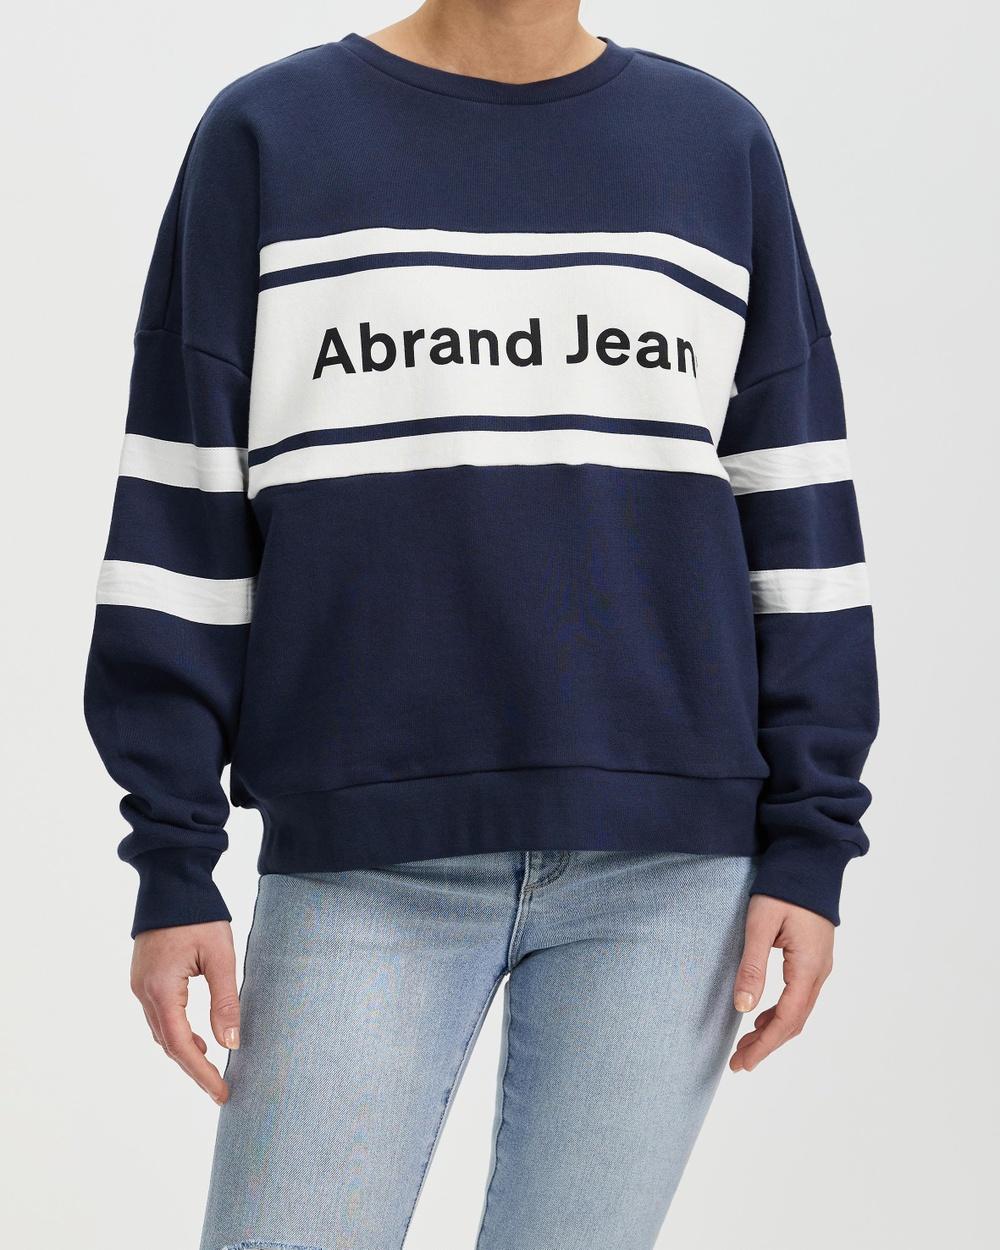 Abrand Oversized Panelled Sweater Sweats 70's Navy